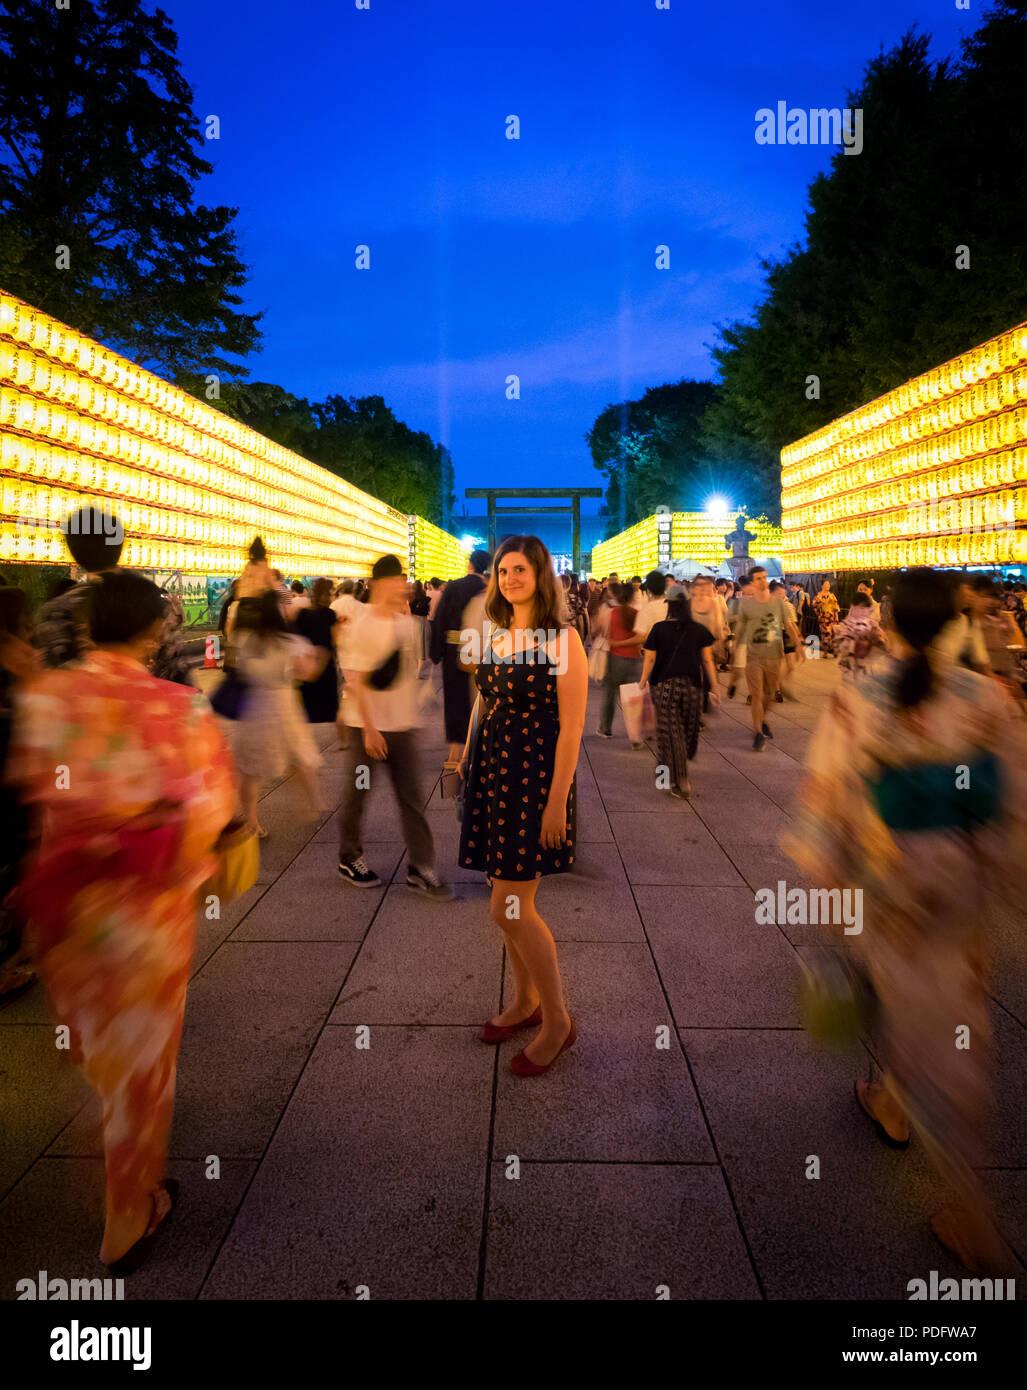 Crowds at the 2018 Mitama Matsuri (Mitama Festival), a famous Japanese Obon (Bon) summer festival. Yasukuni Shrine, Ichigaya, Tokyo, Japan. - Stock Image